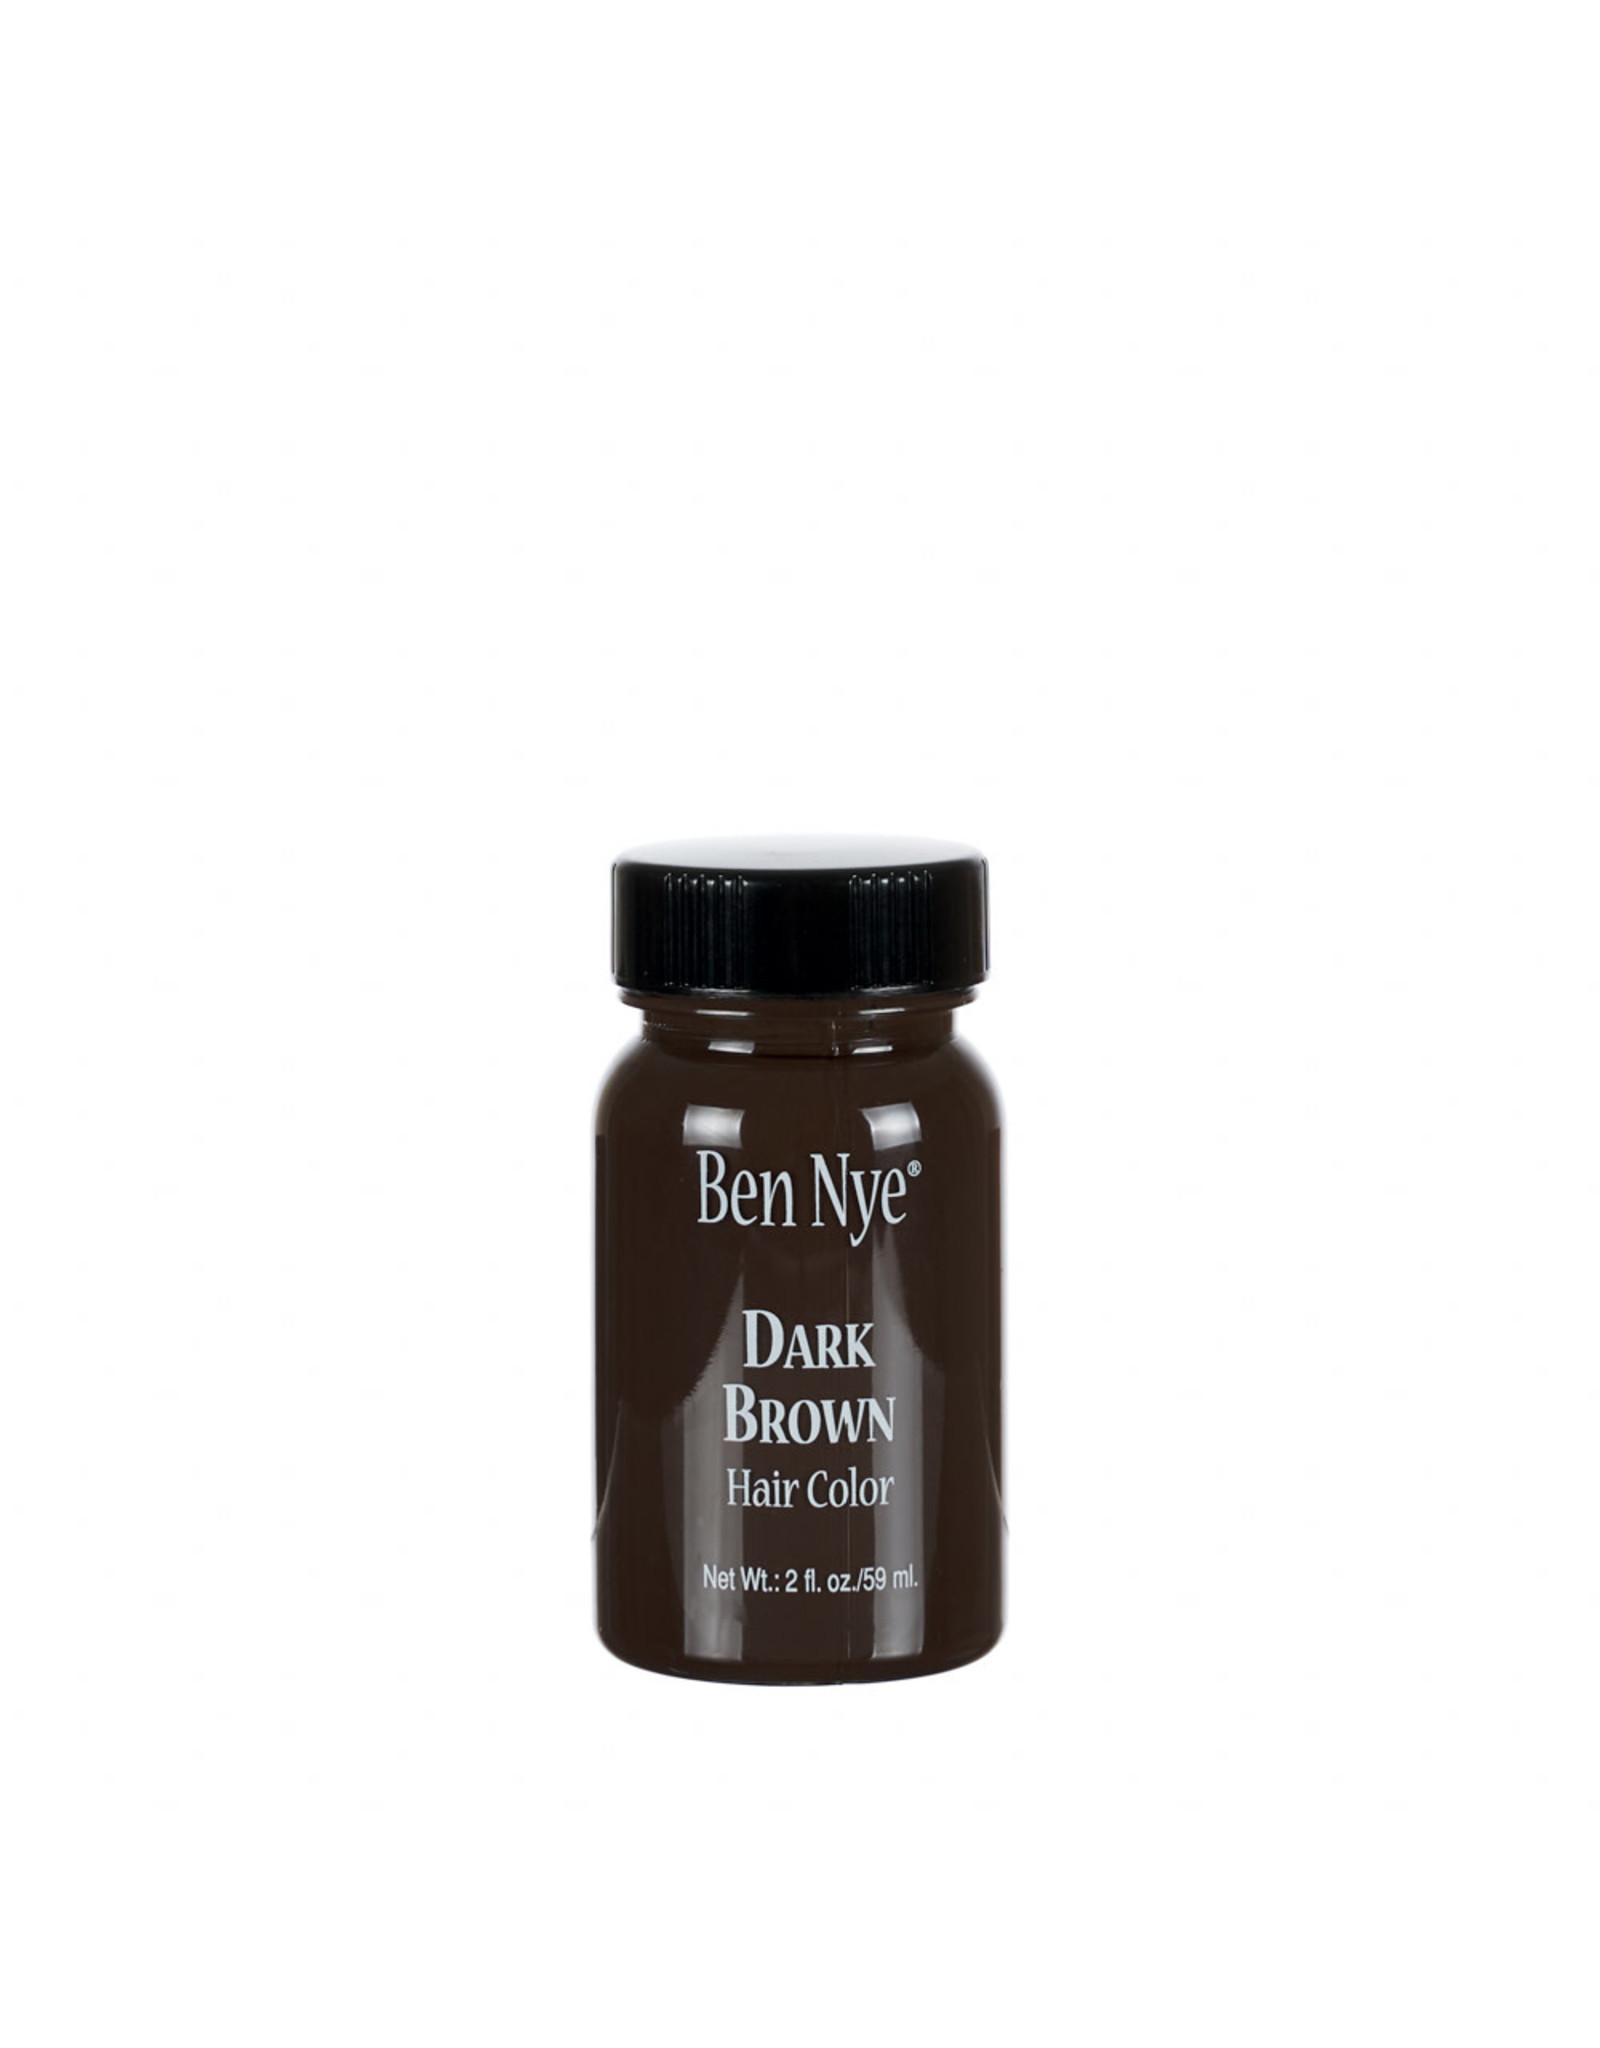 Ben Nye Ben Nye Dark Brown Hair Color